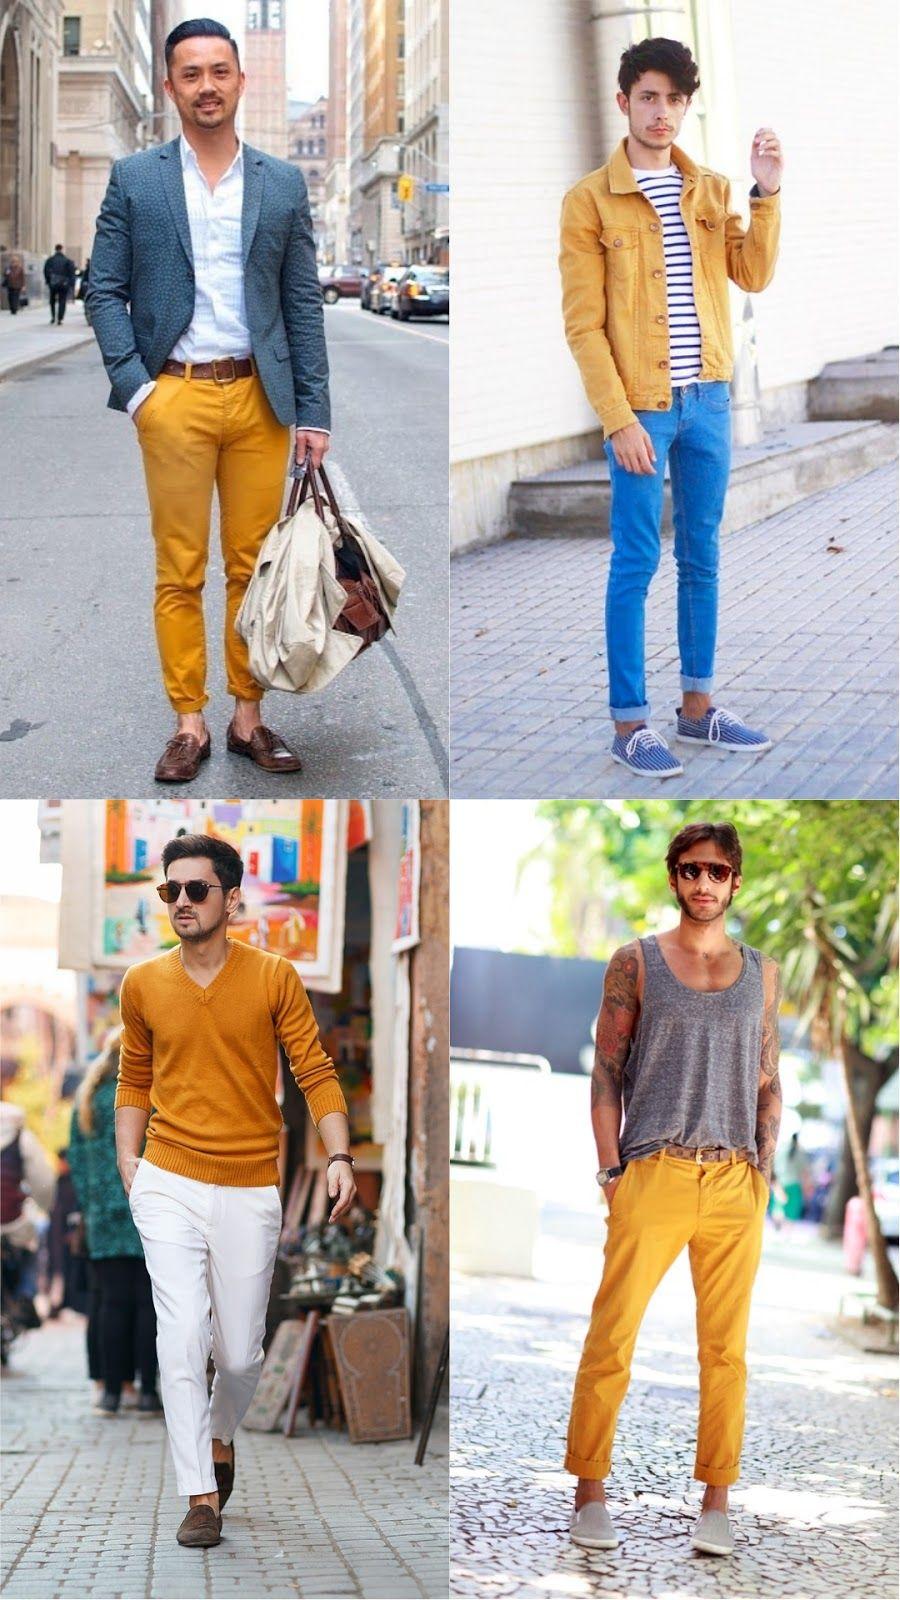 8b0a5c9bf tendencias-moda-masculina-primavera-verao-2019-blog -tres-chic-amarelo-mostarda-2